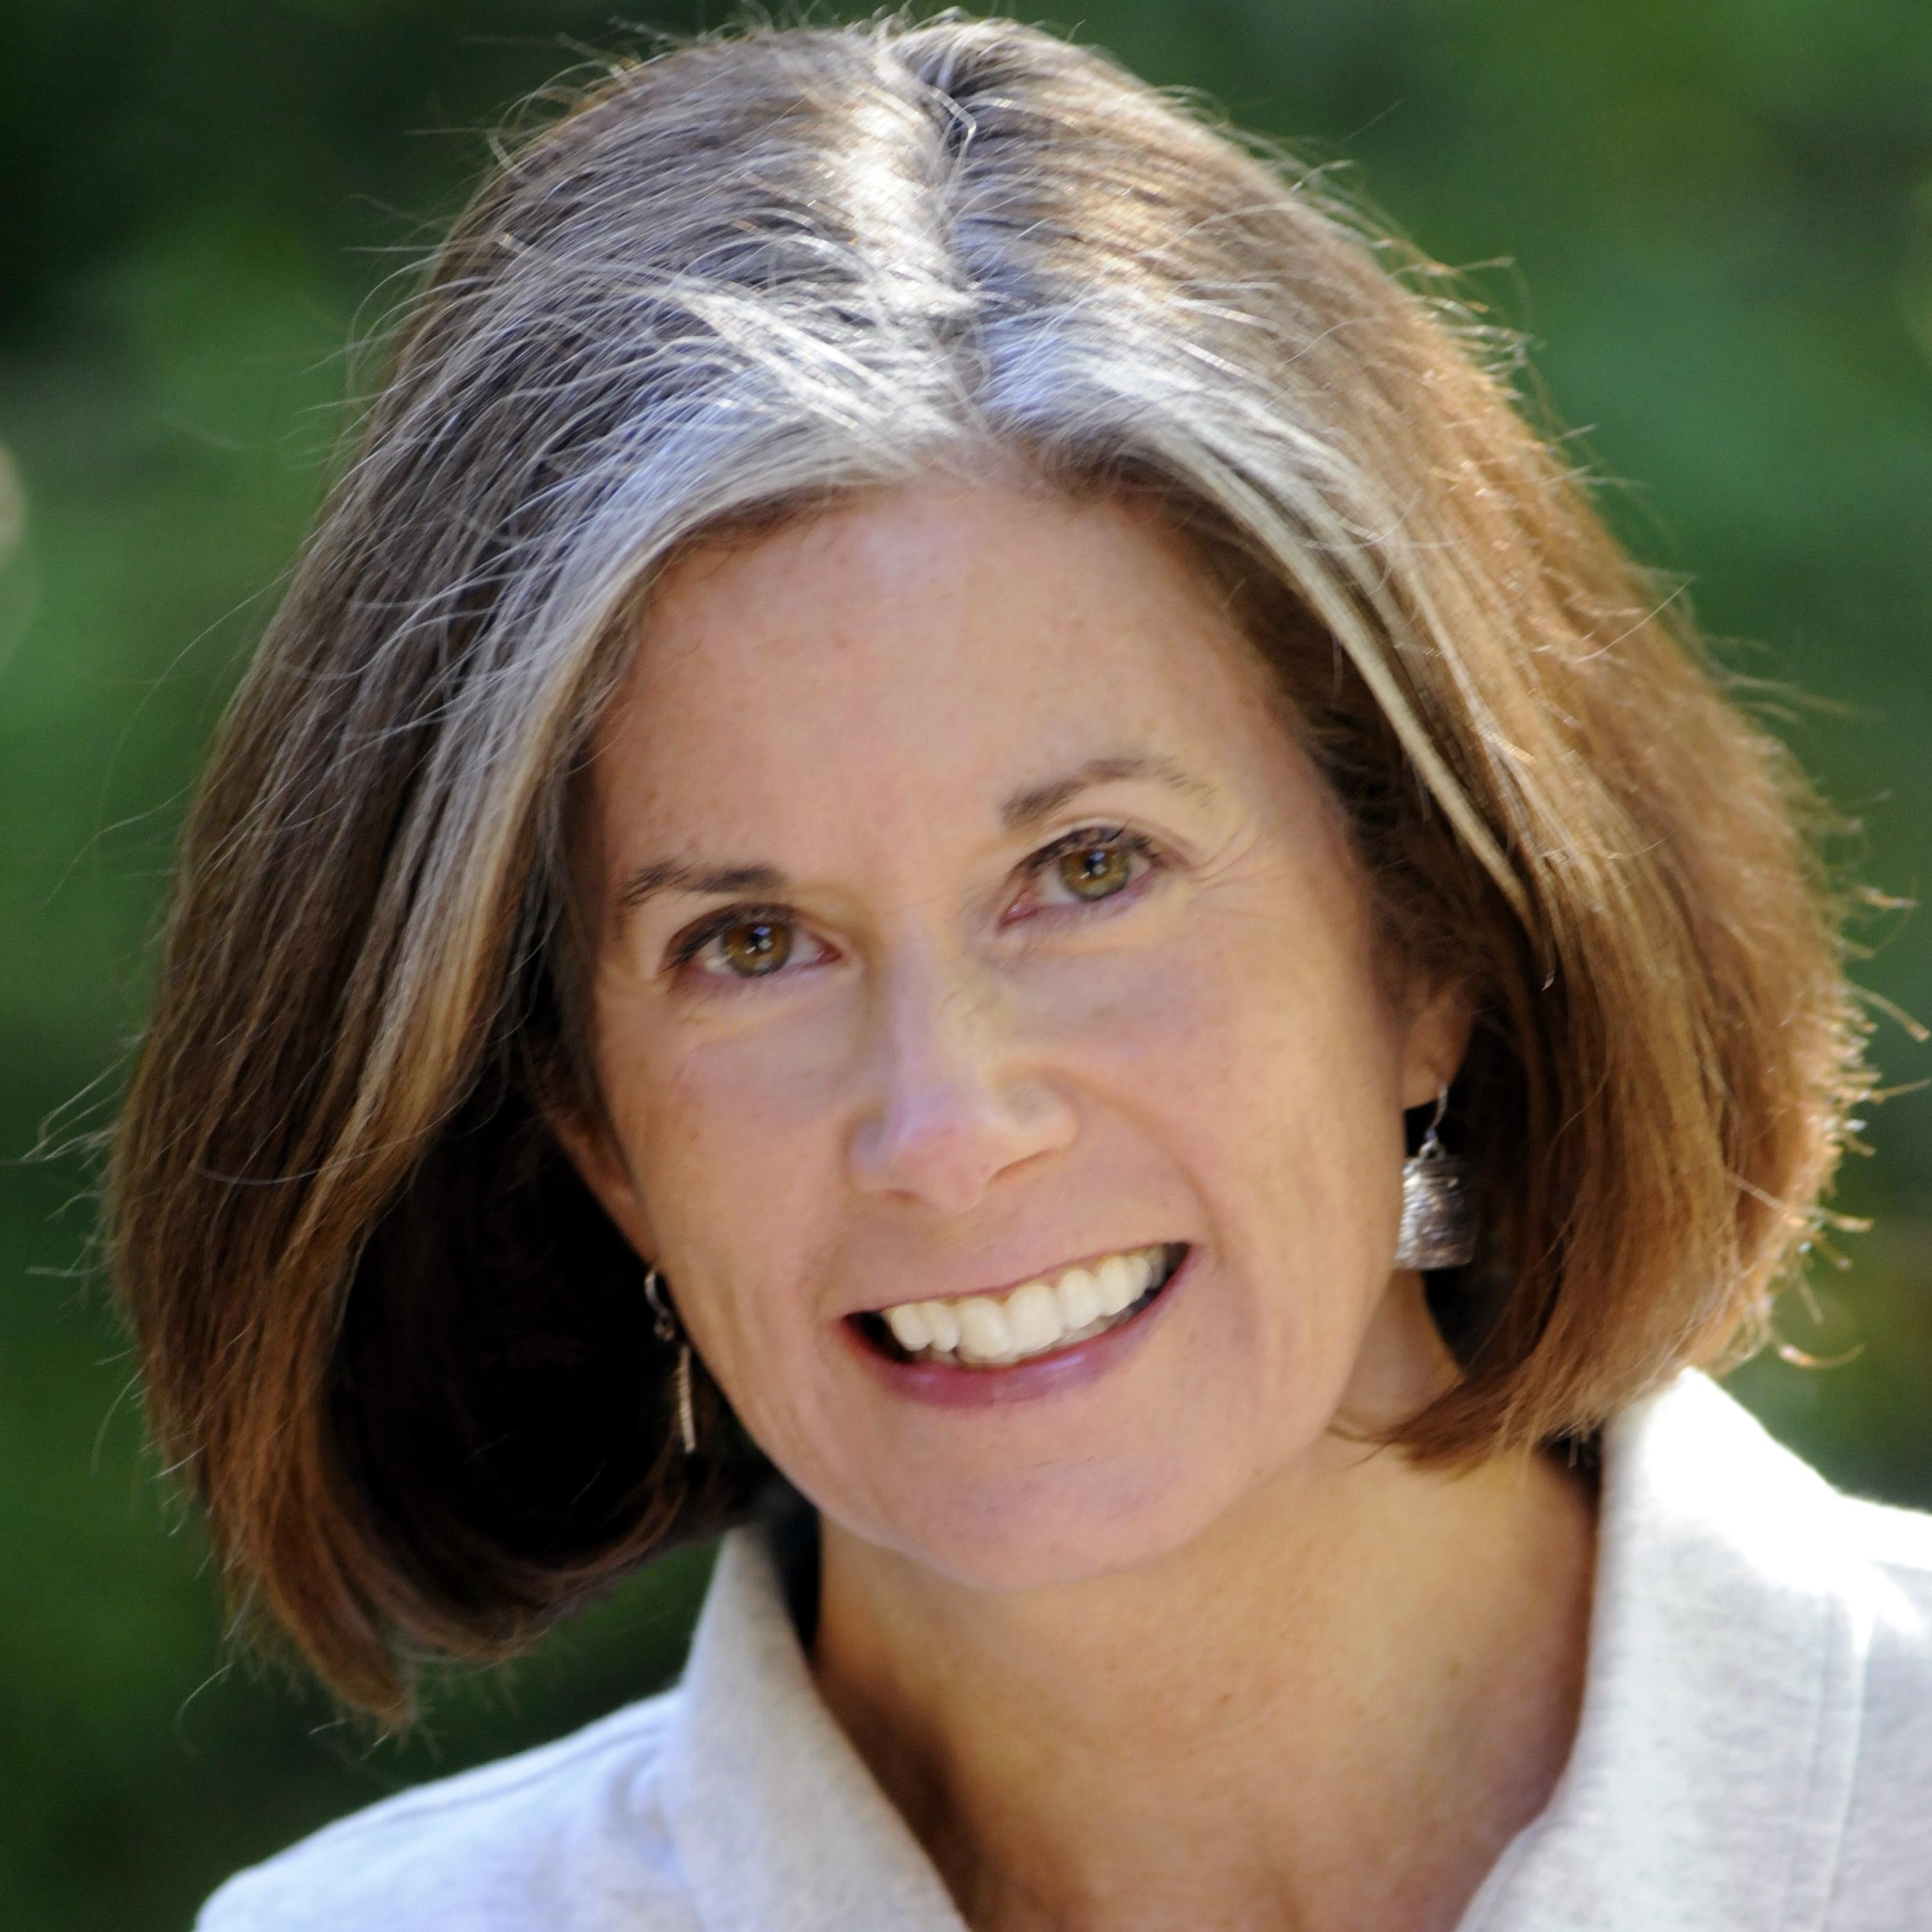 Kate Blair